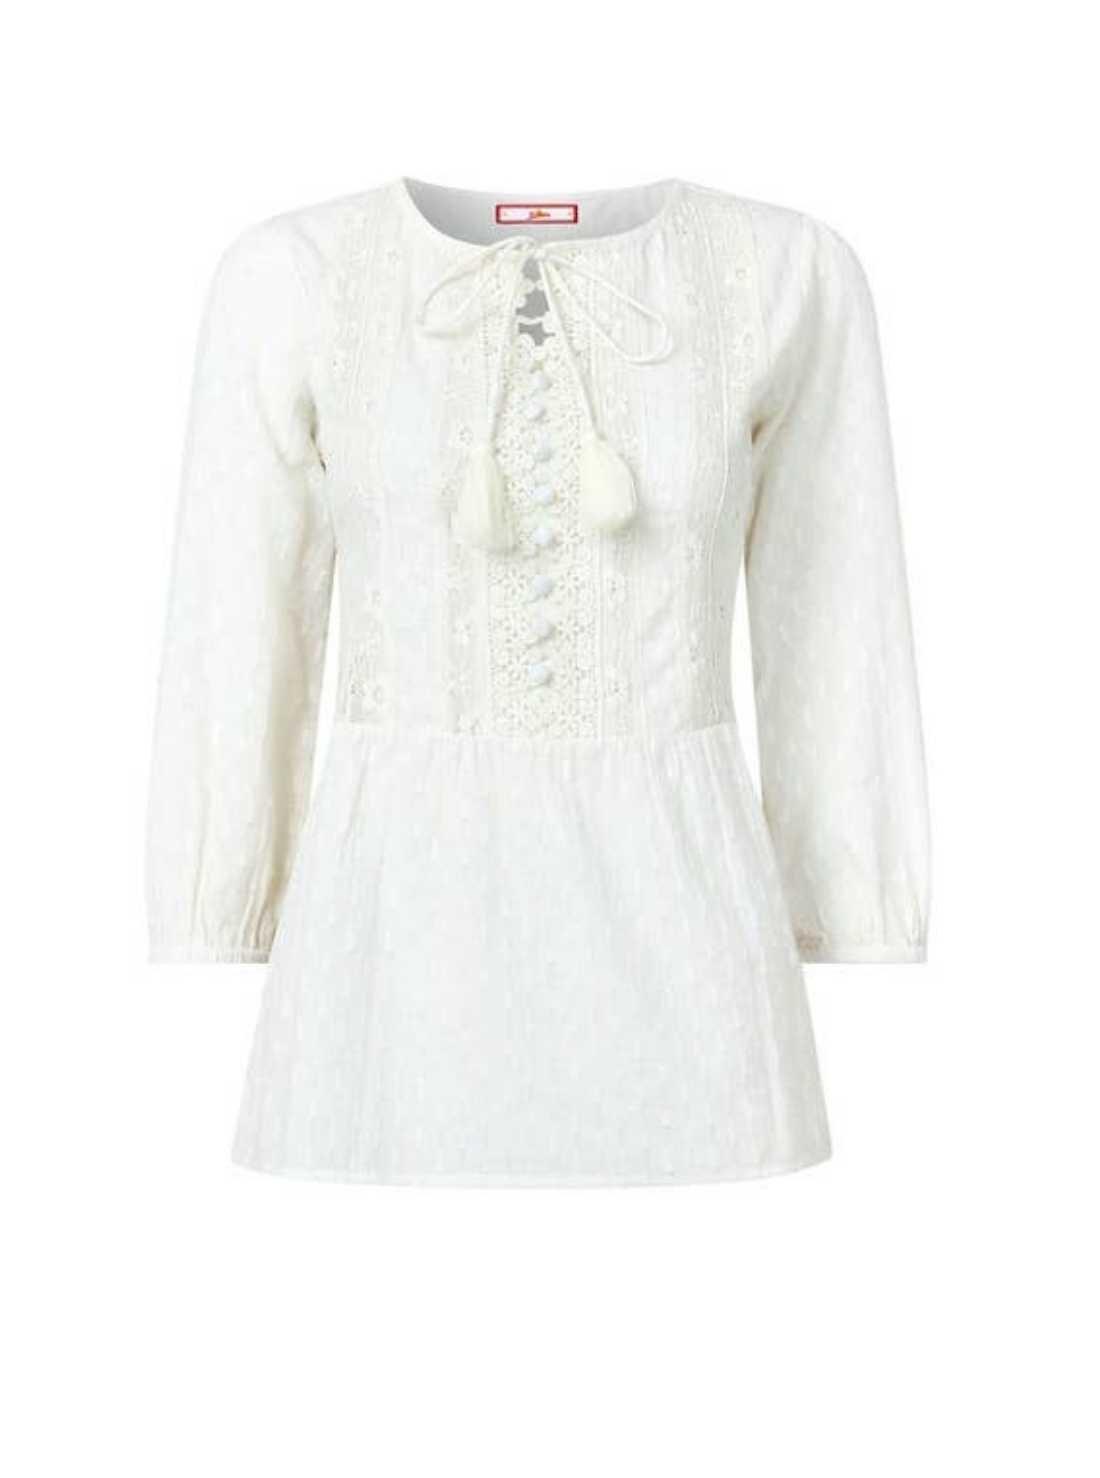 Delicate lace boho blouse